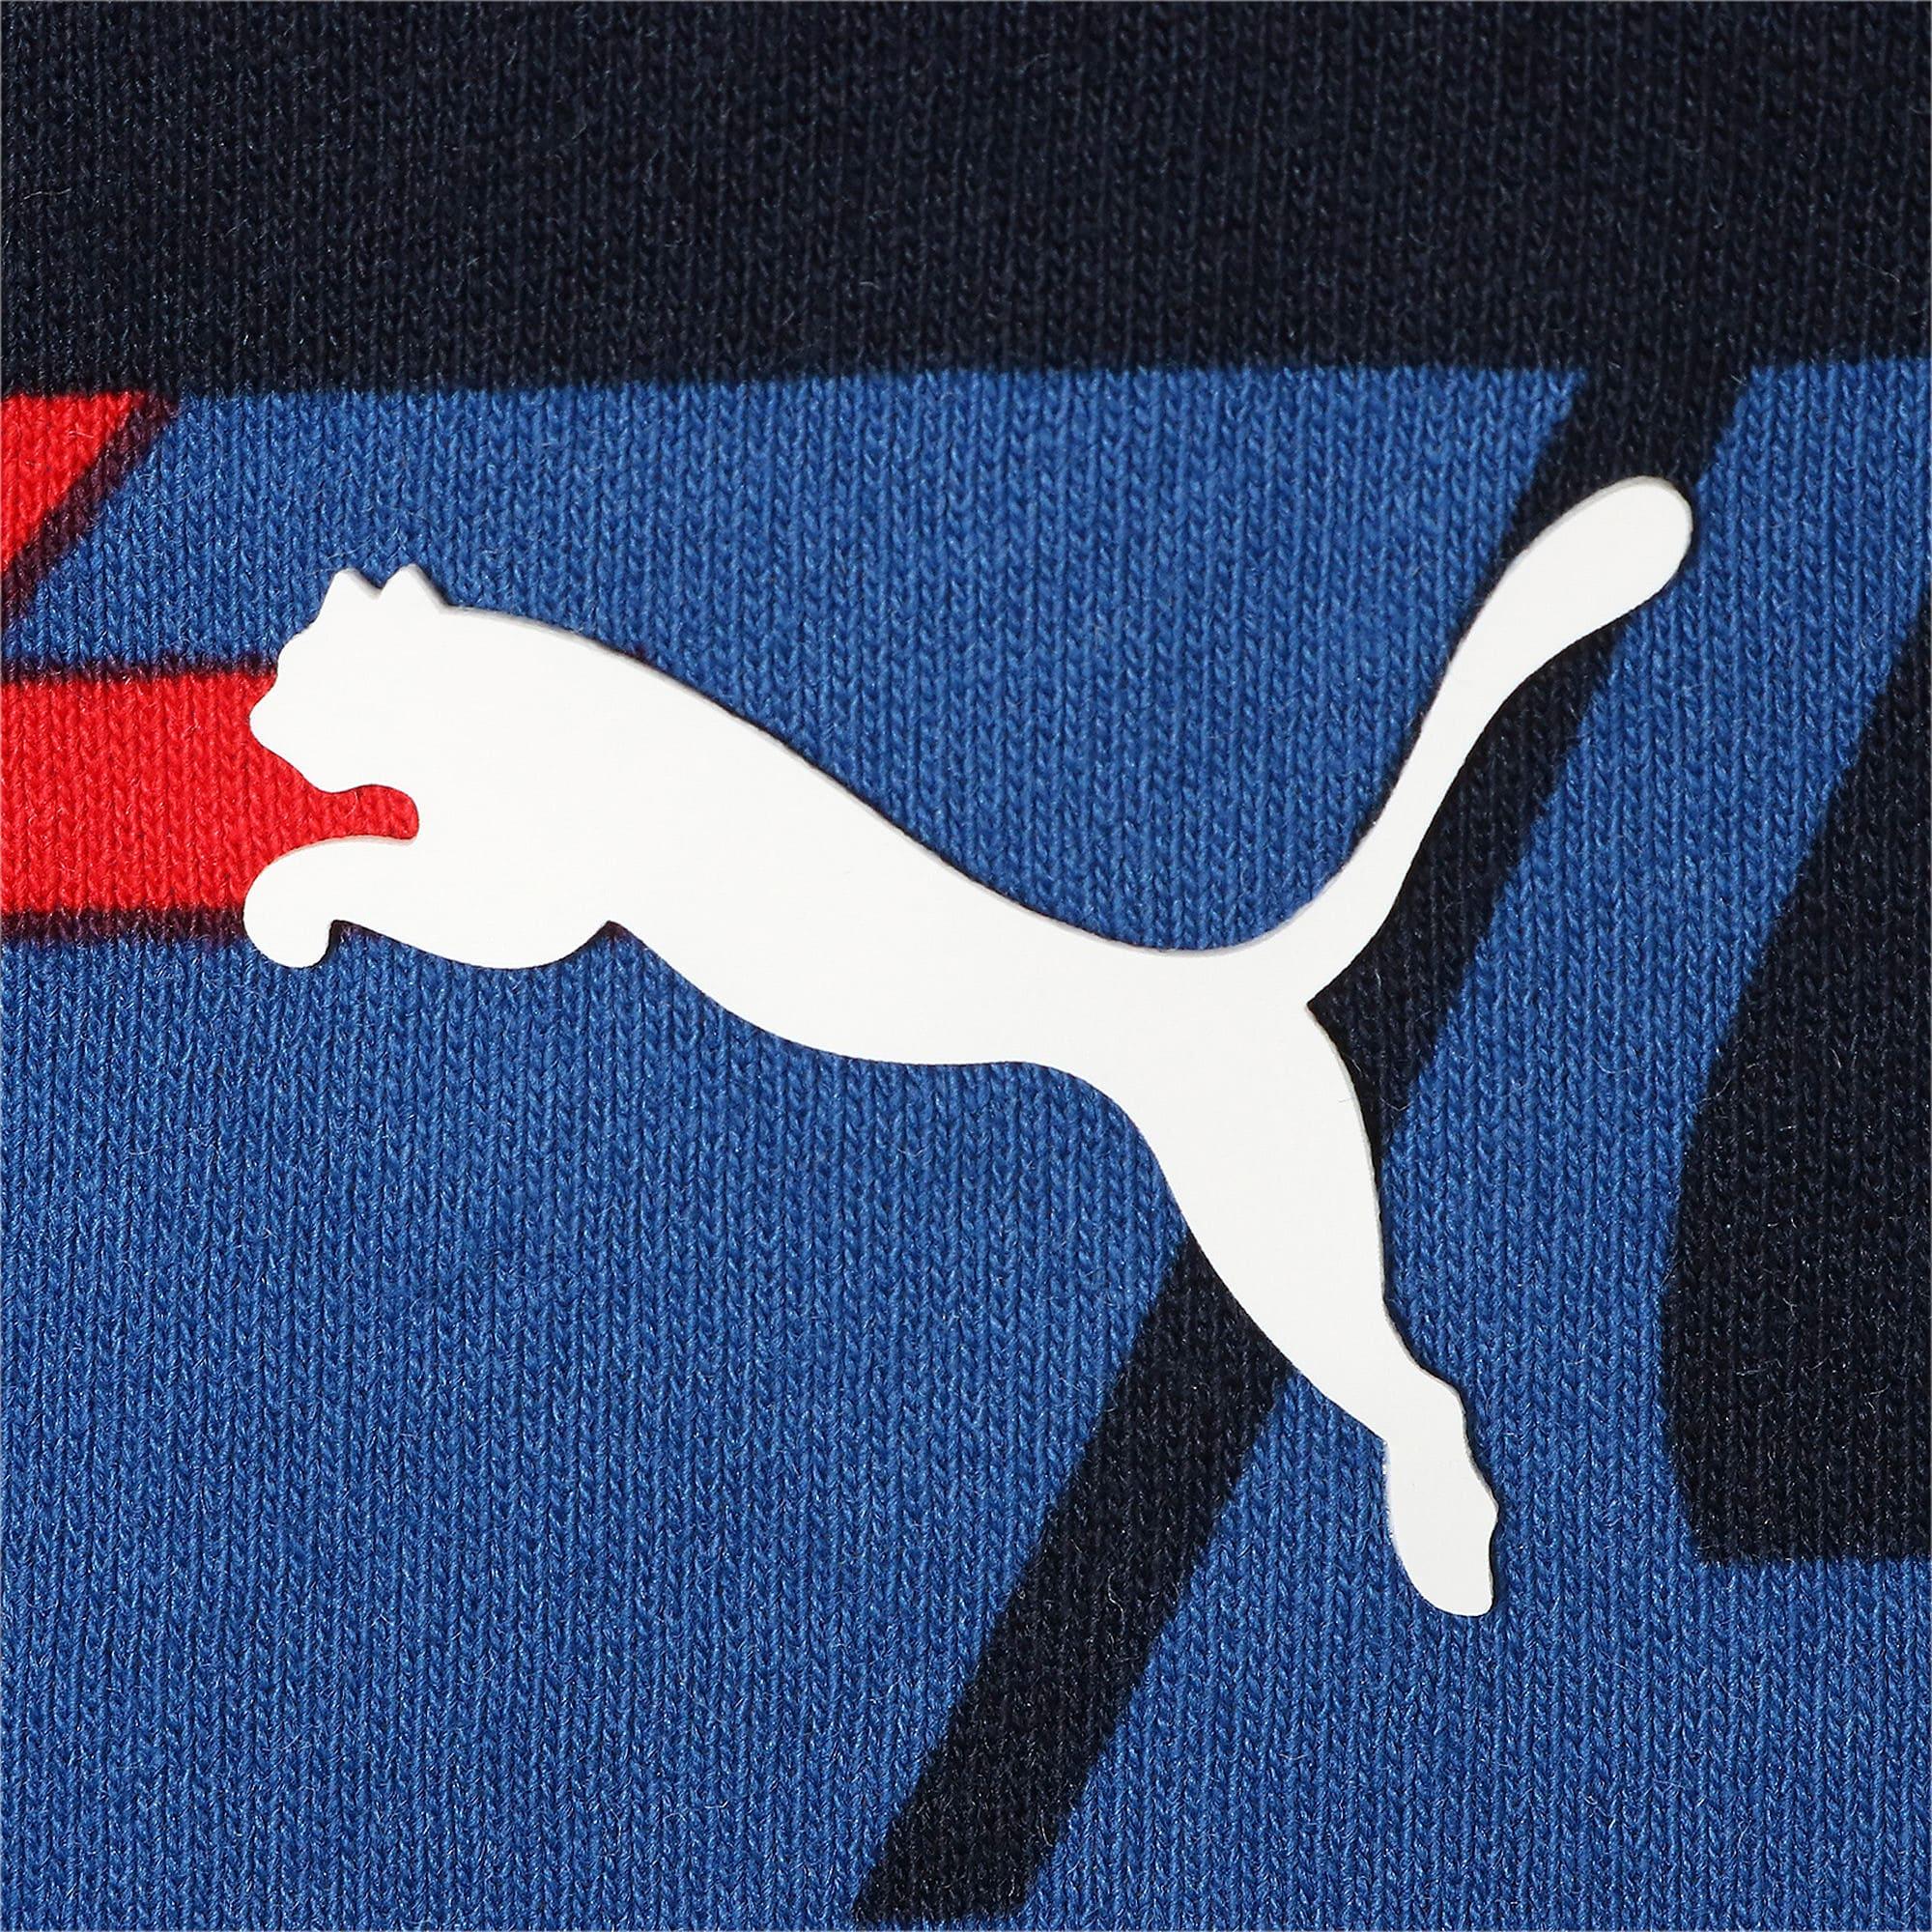 Thumbnail 4 of フェラーリ ストリート Tシャツ 半袖, Galaxy Blue, medium-JPN